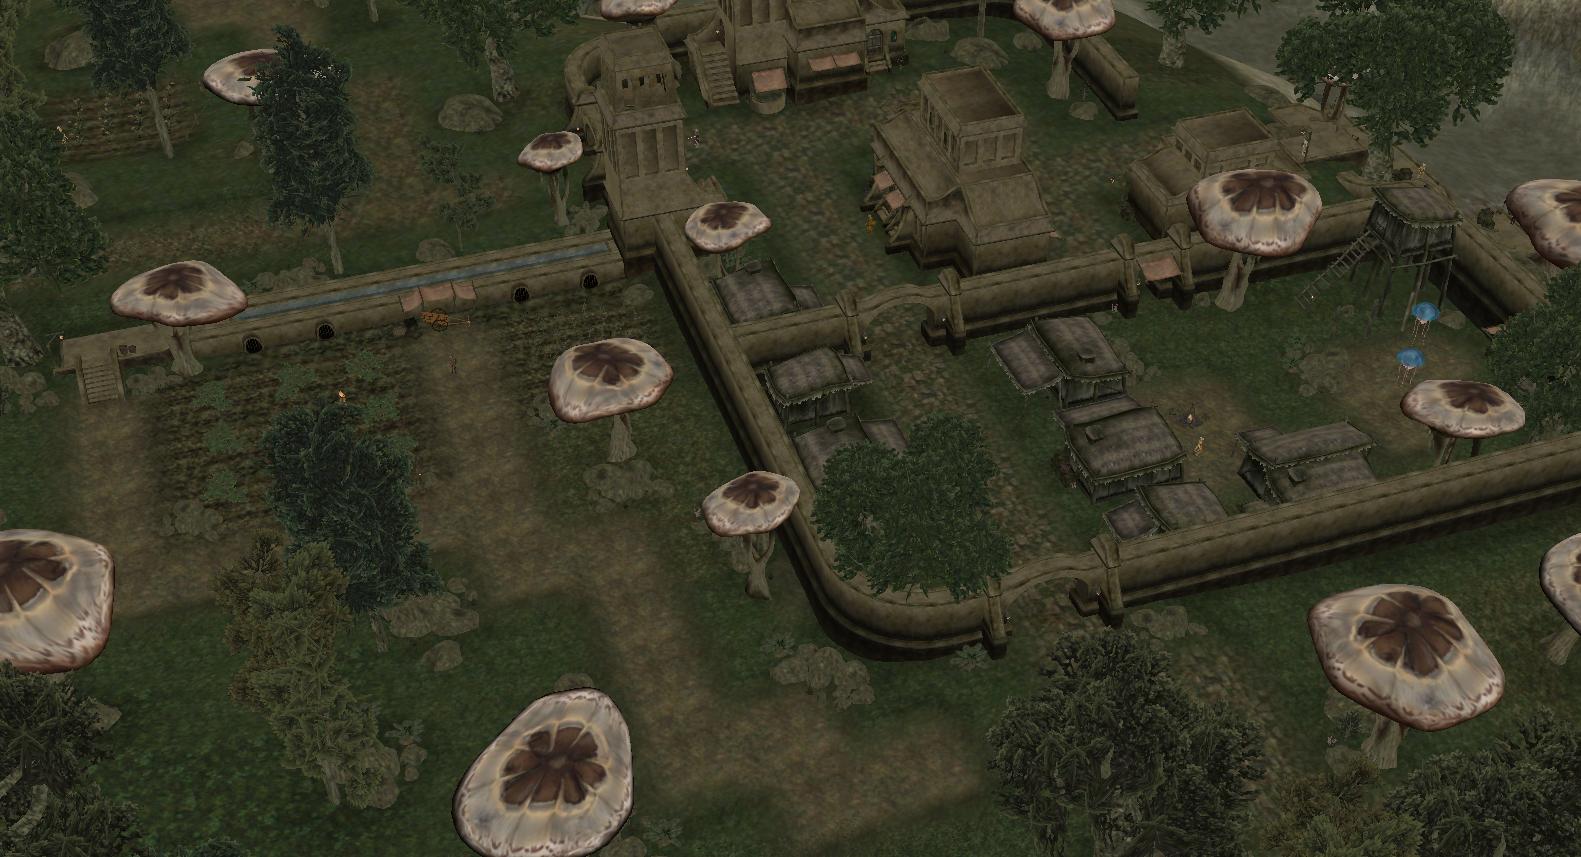 RELEASE] Morrowind Rebirth 4 7 + 4 71 news - Mod DB